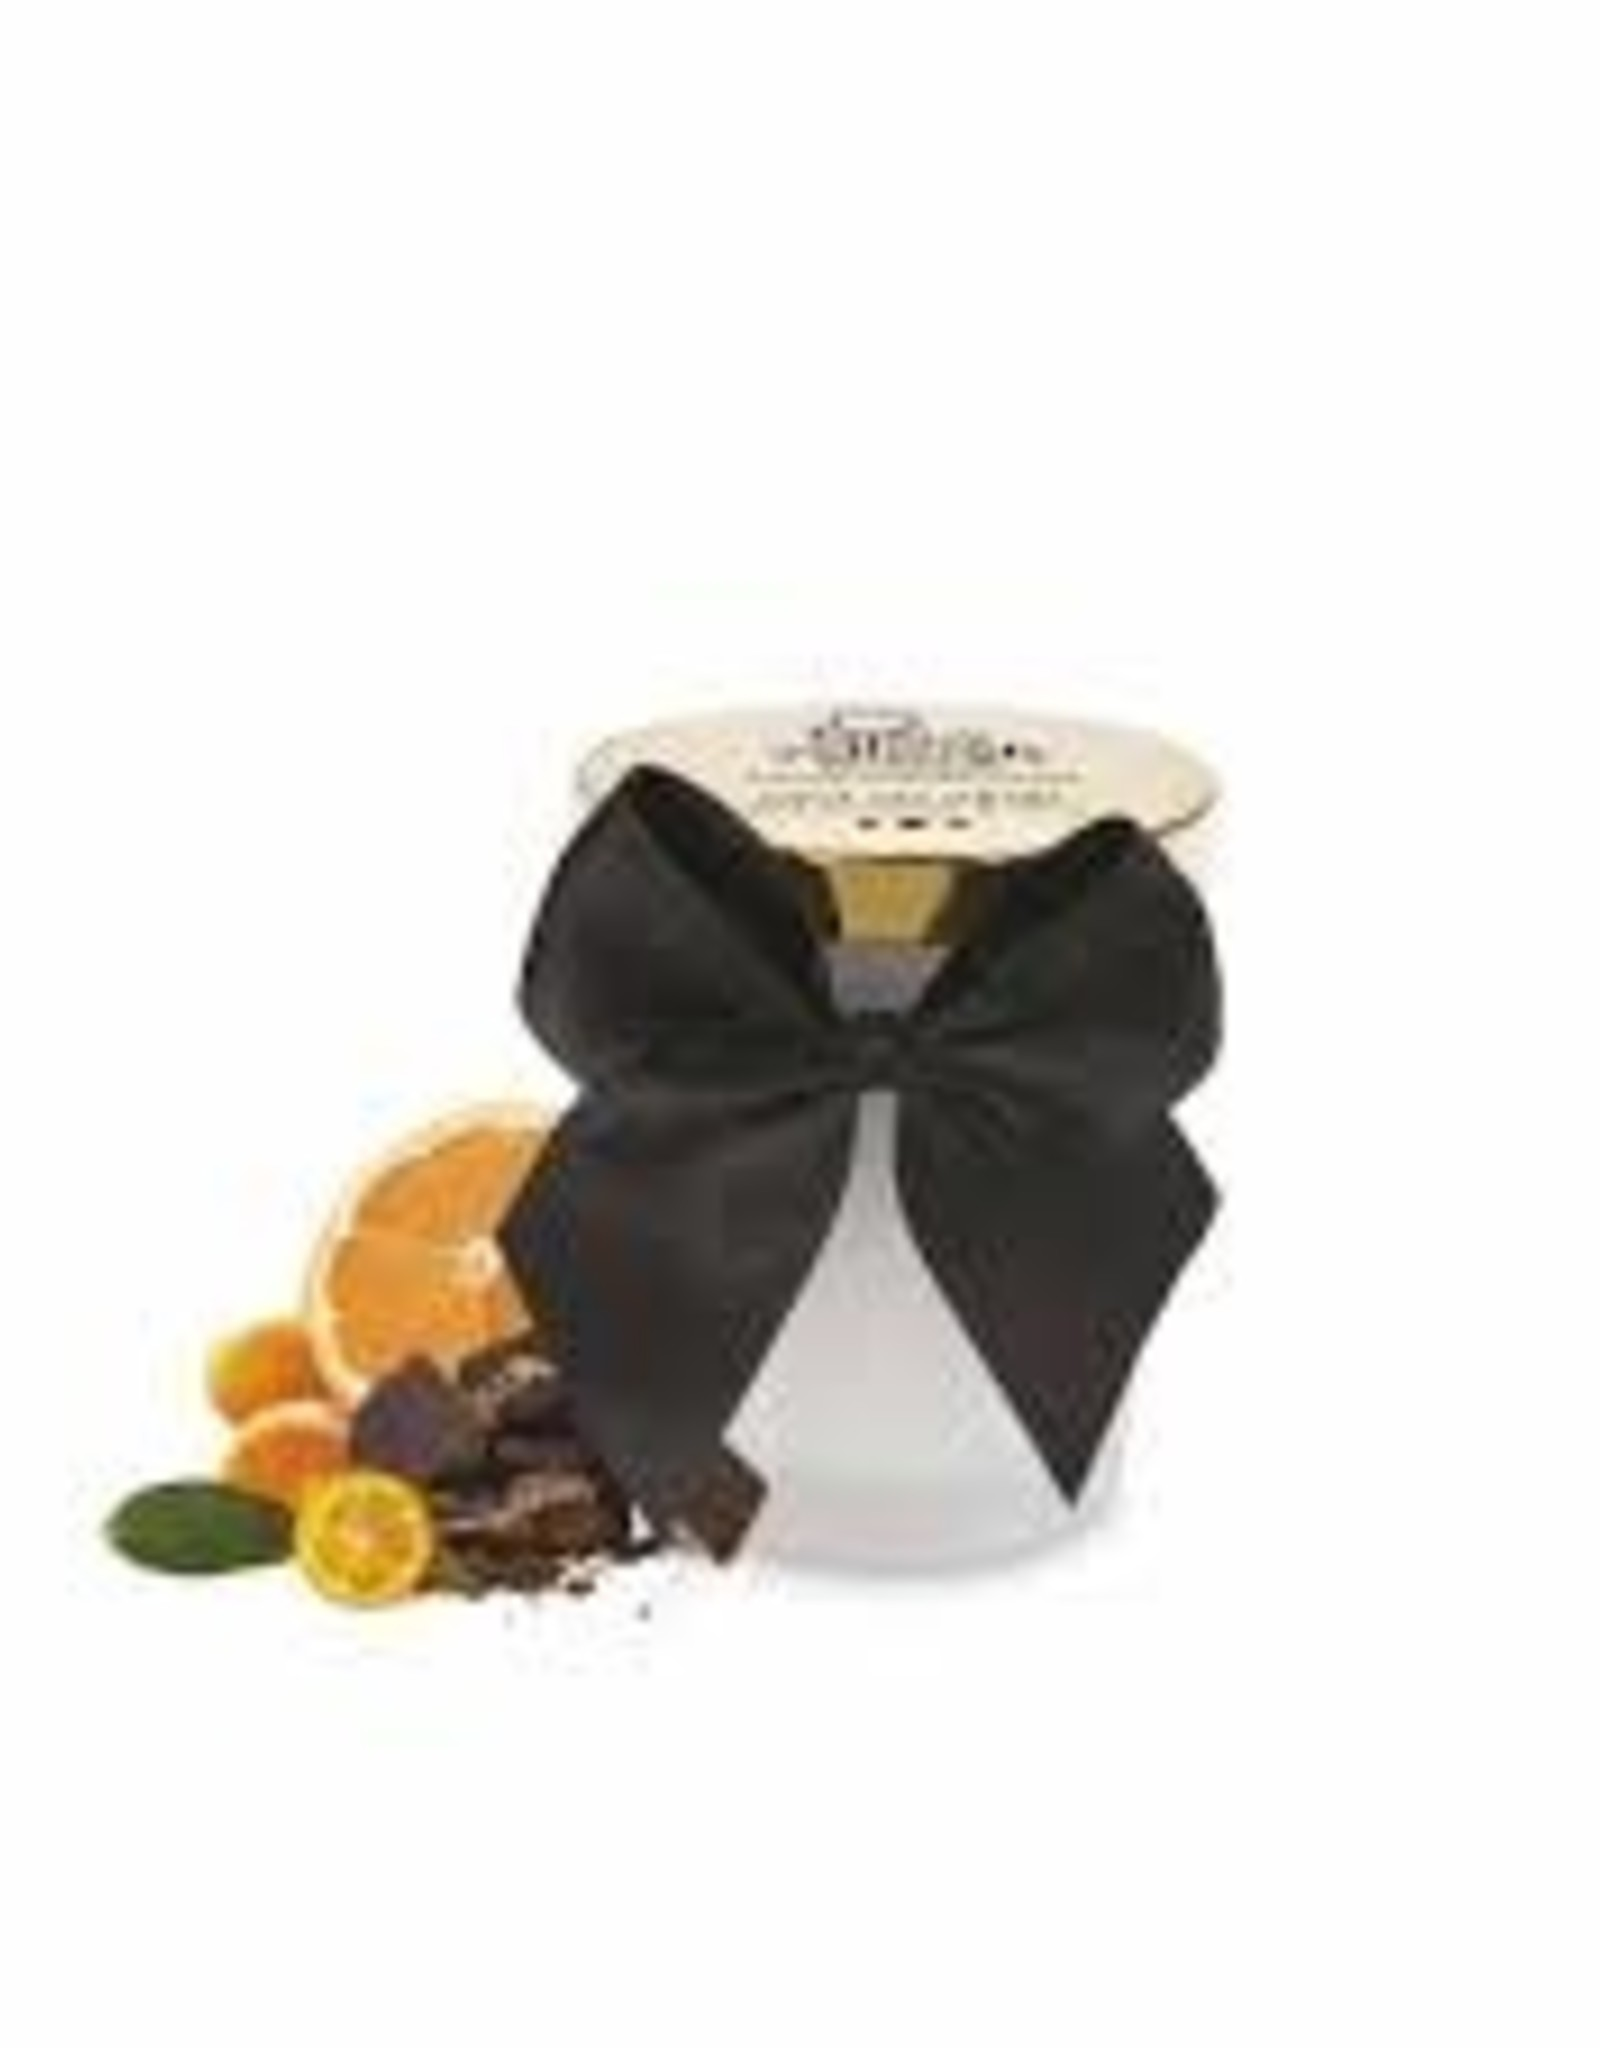 Bijoux Indiscrets Melt my heart - Kissable massage candle - Dark Chocolate & Citrus